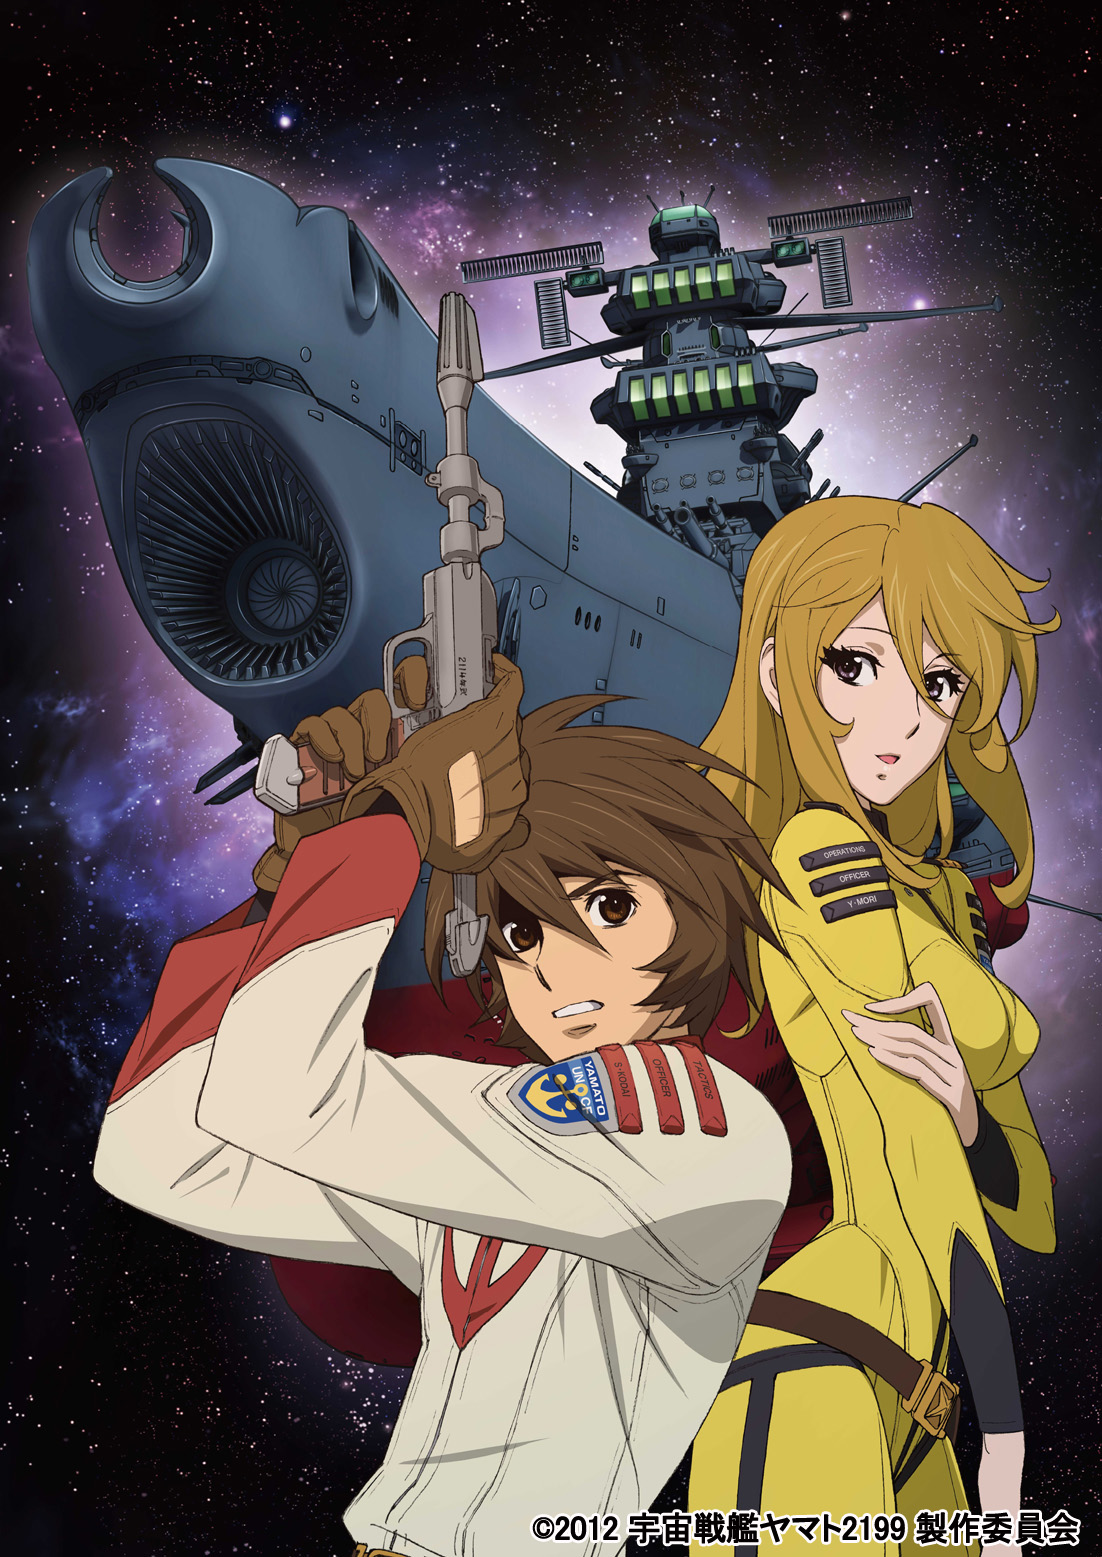 Nuevo anime Uchuu Senkan Yamato 2199 en 2016